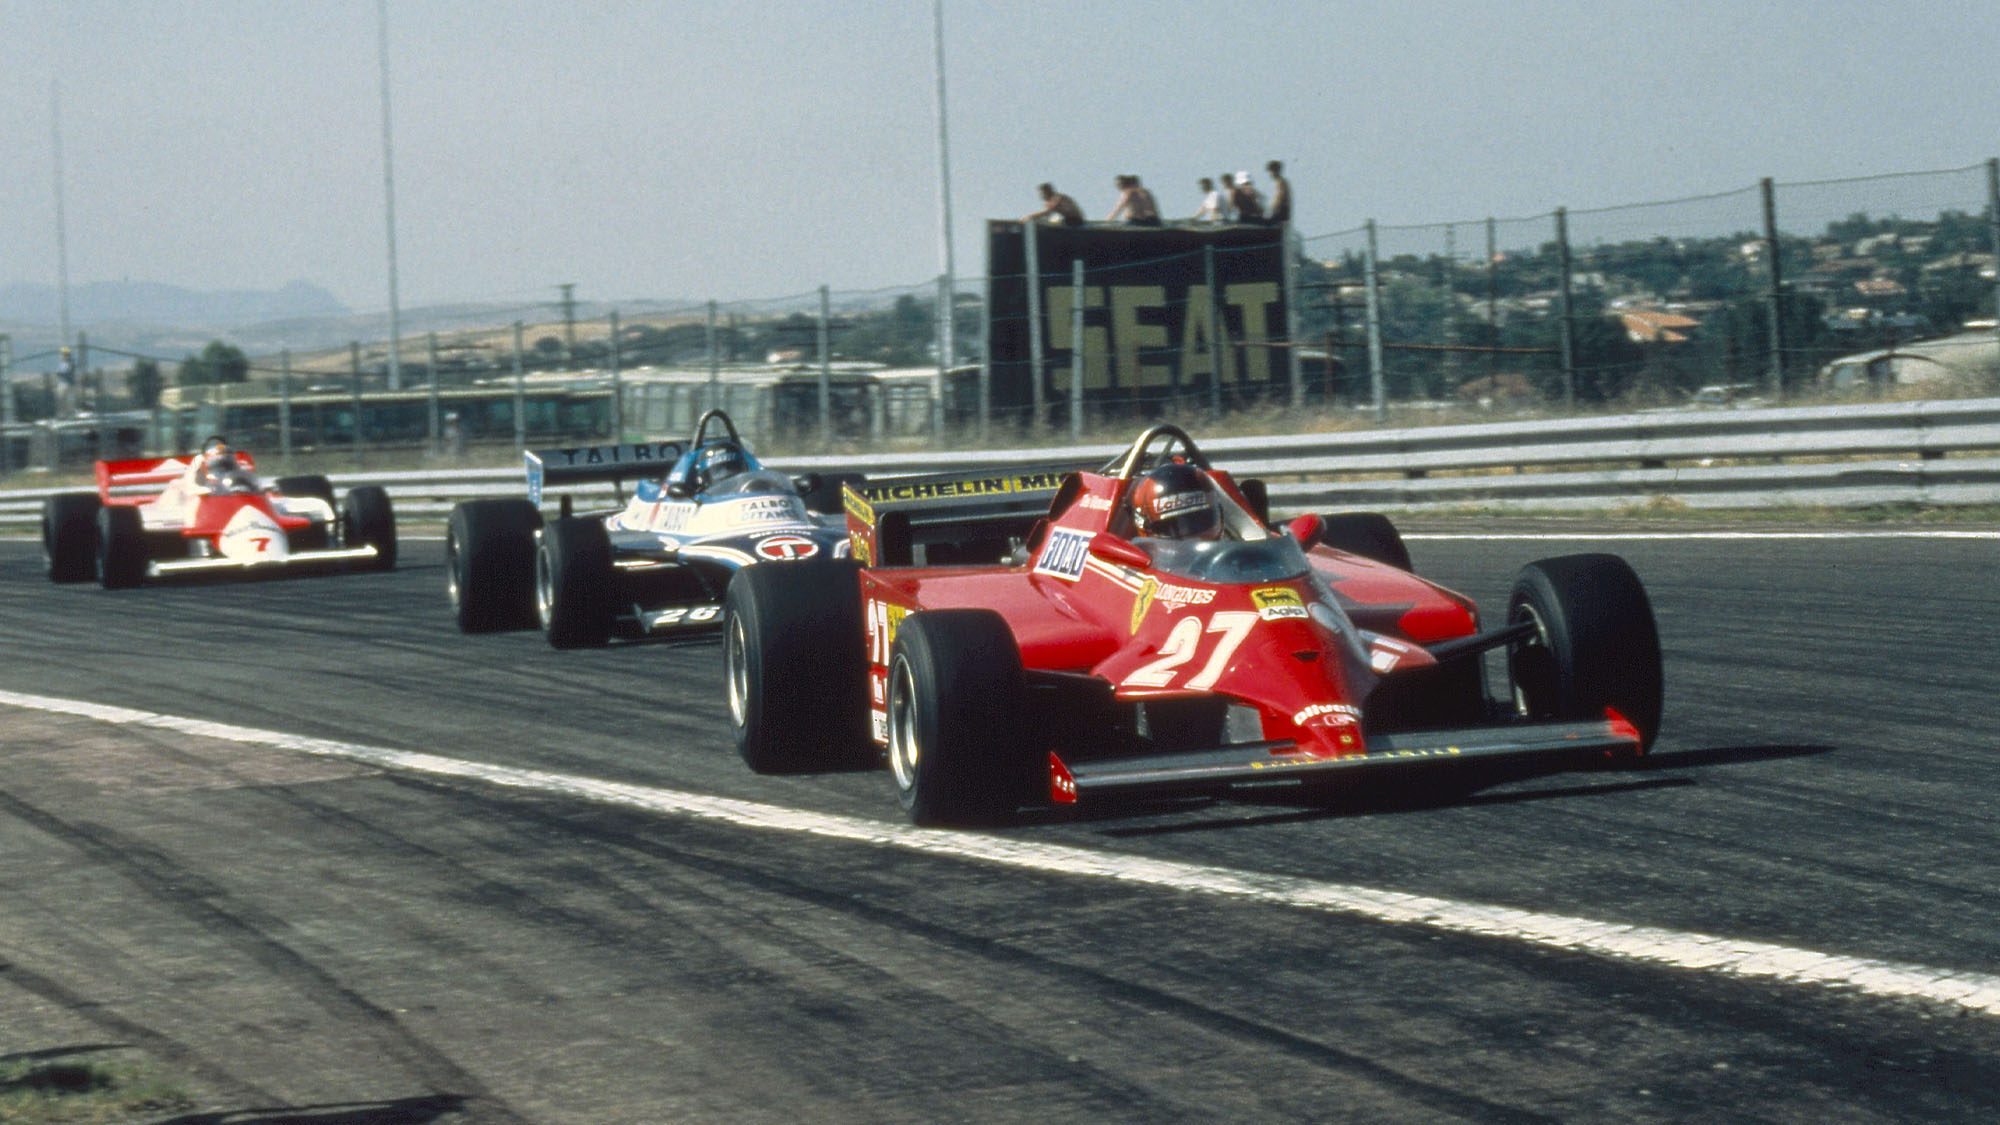 MOTORSPORT - F1 1981 - SPAIN GP - JARAMA - PHOTO: DPPI GILLES VILLENEUVE (CAN) / FERRARI 126CK - ACTION - WINNER